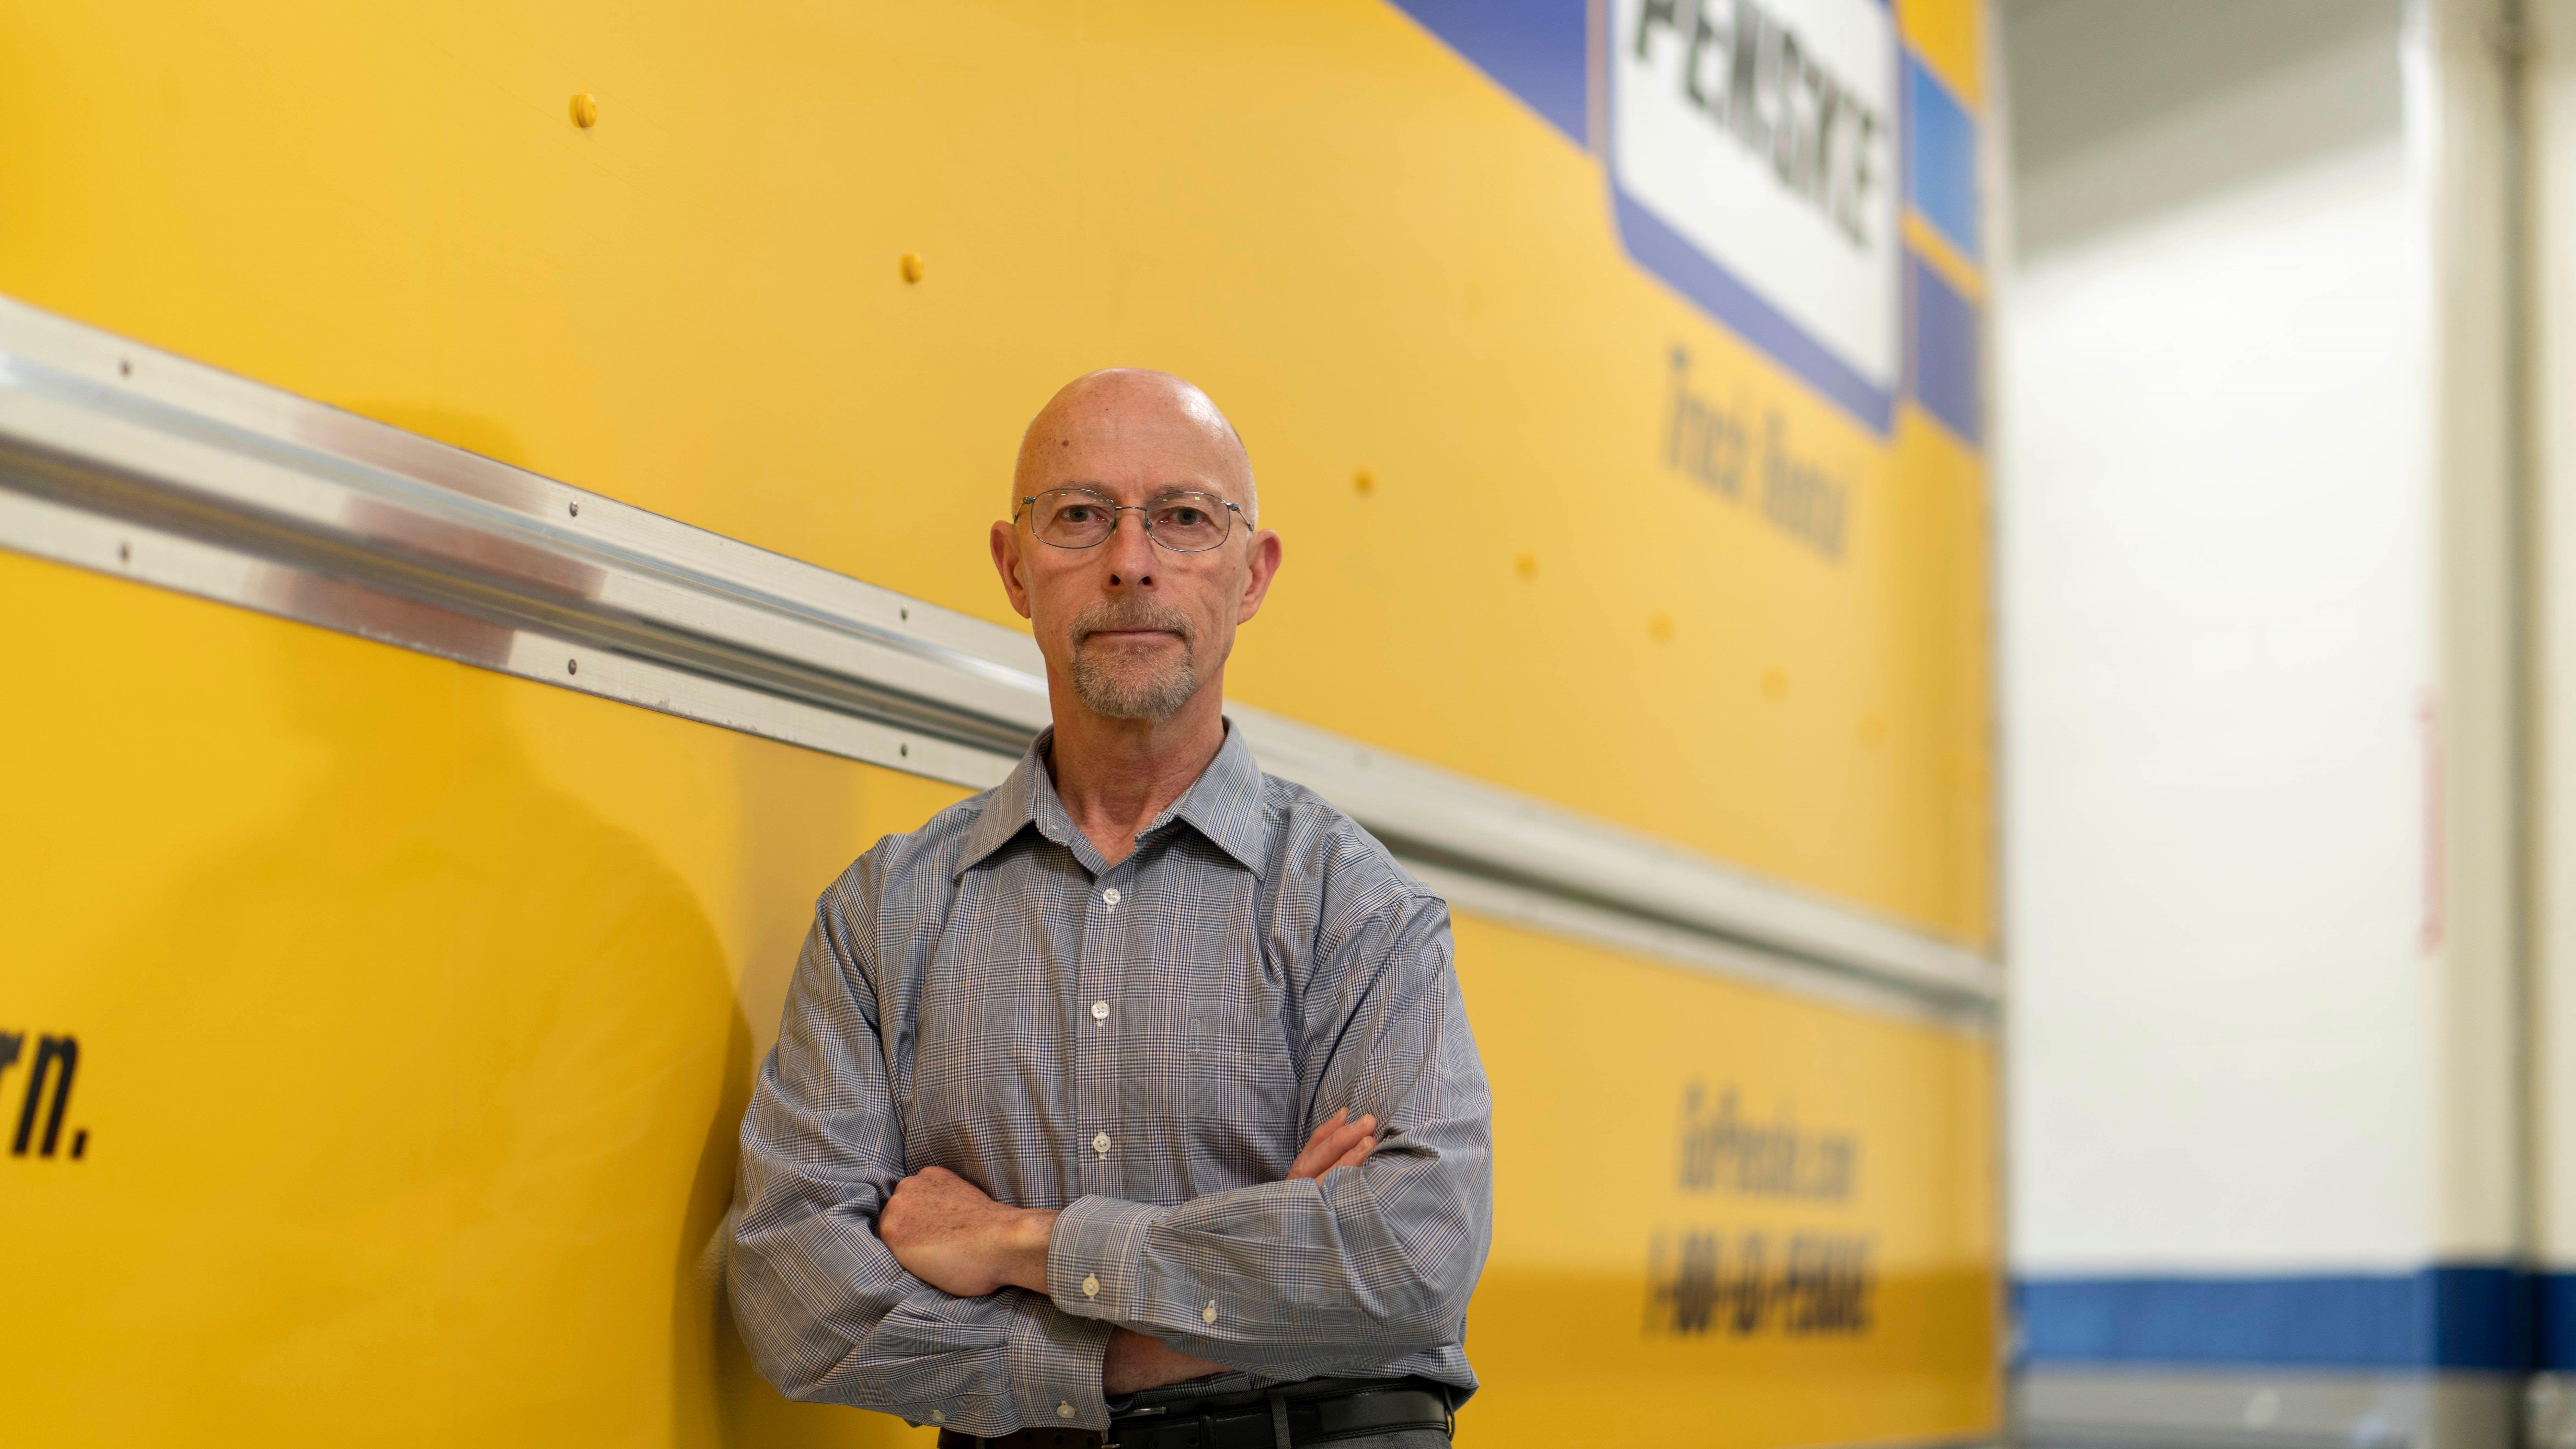 Penske Truck Leasing's Mike Hasinec Received CCJ Magazine Maintenance Leadership Award